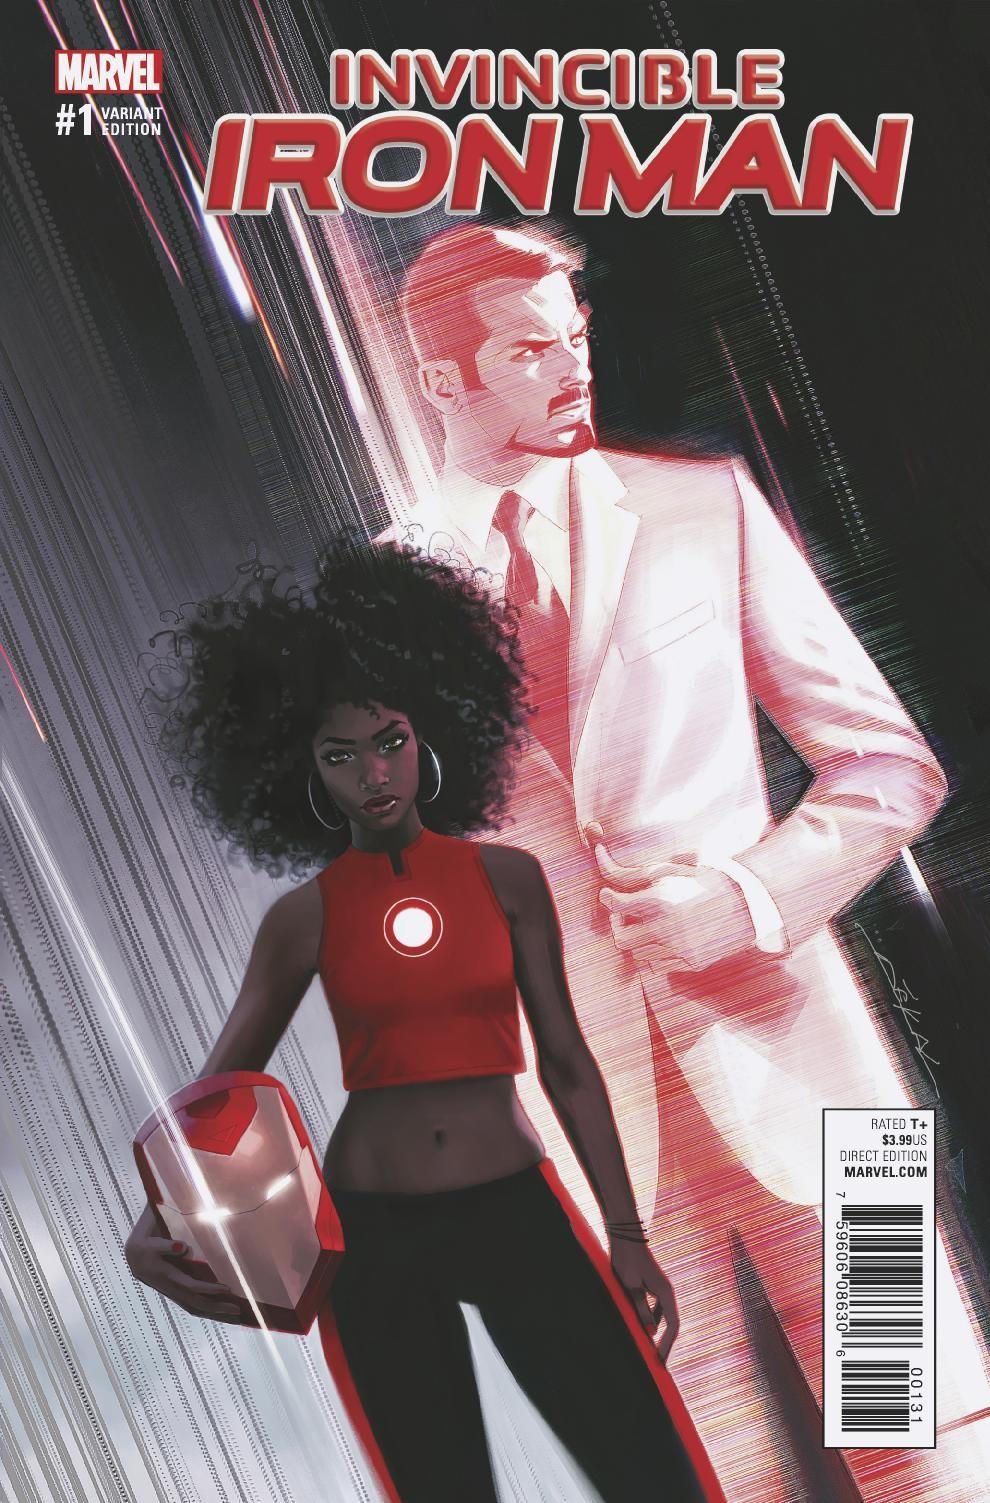 Marvel Previews Riri Williams as Invincible Iron Man